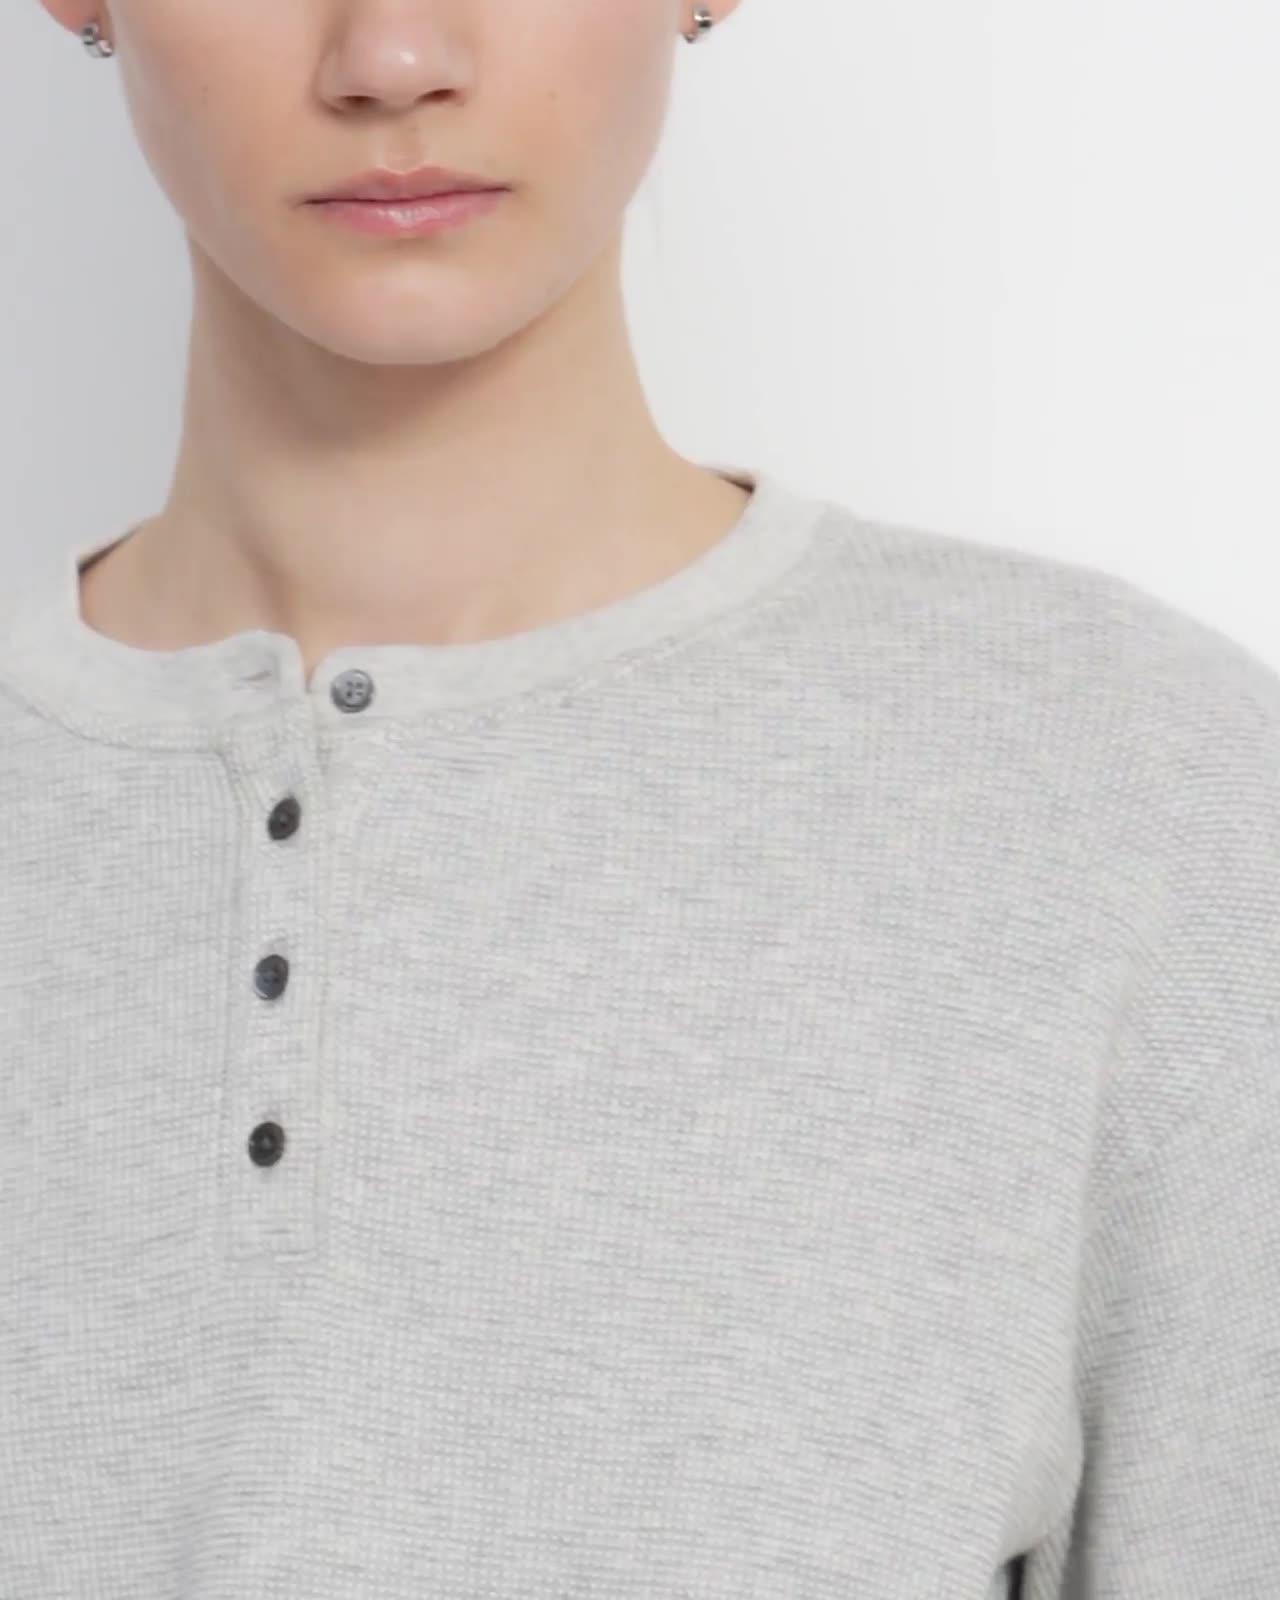 Weekend Henley Shirt in Waffle Knit Cotton